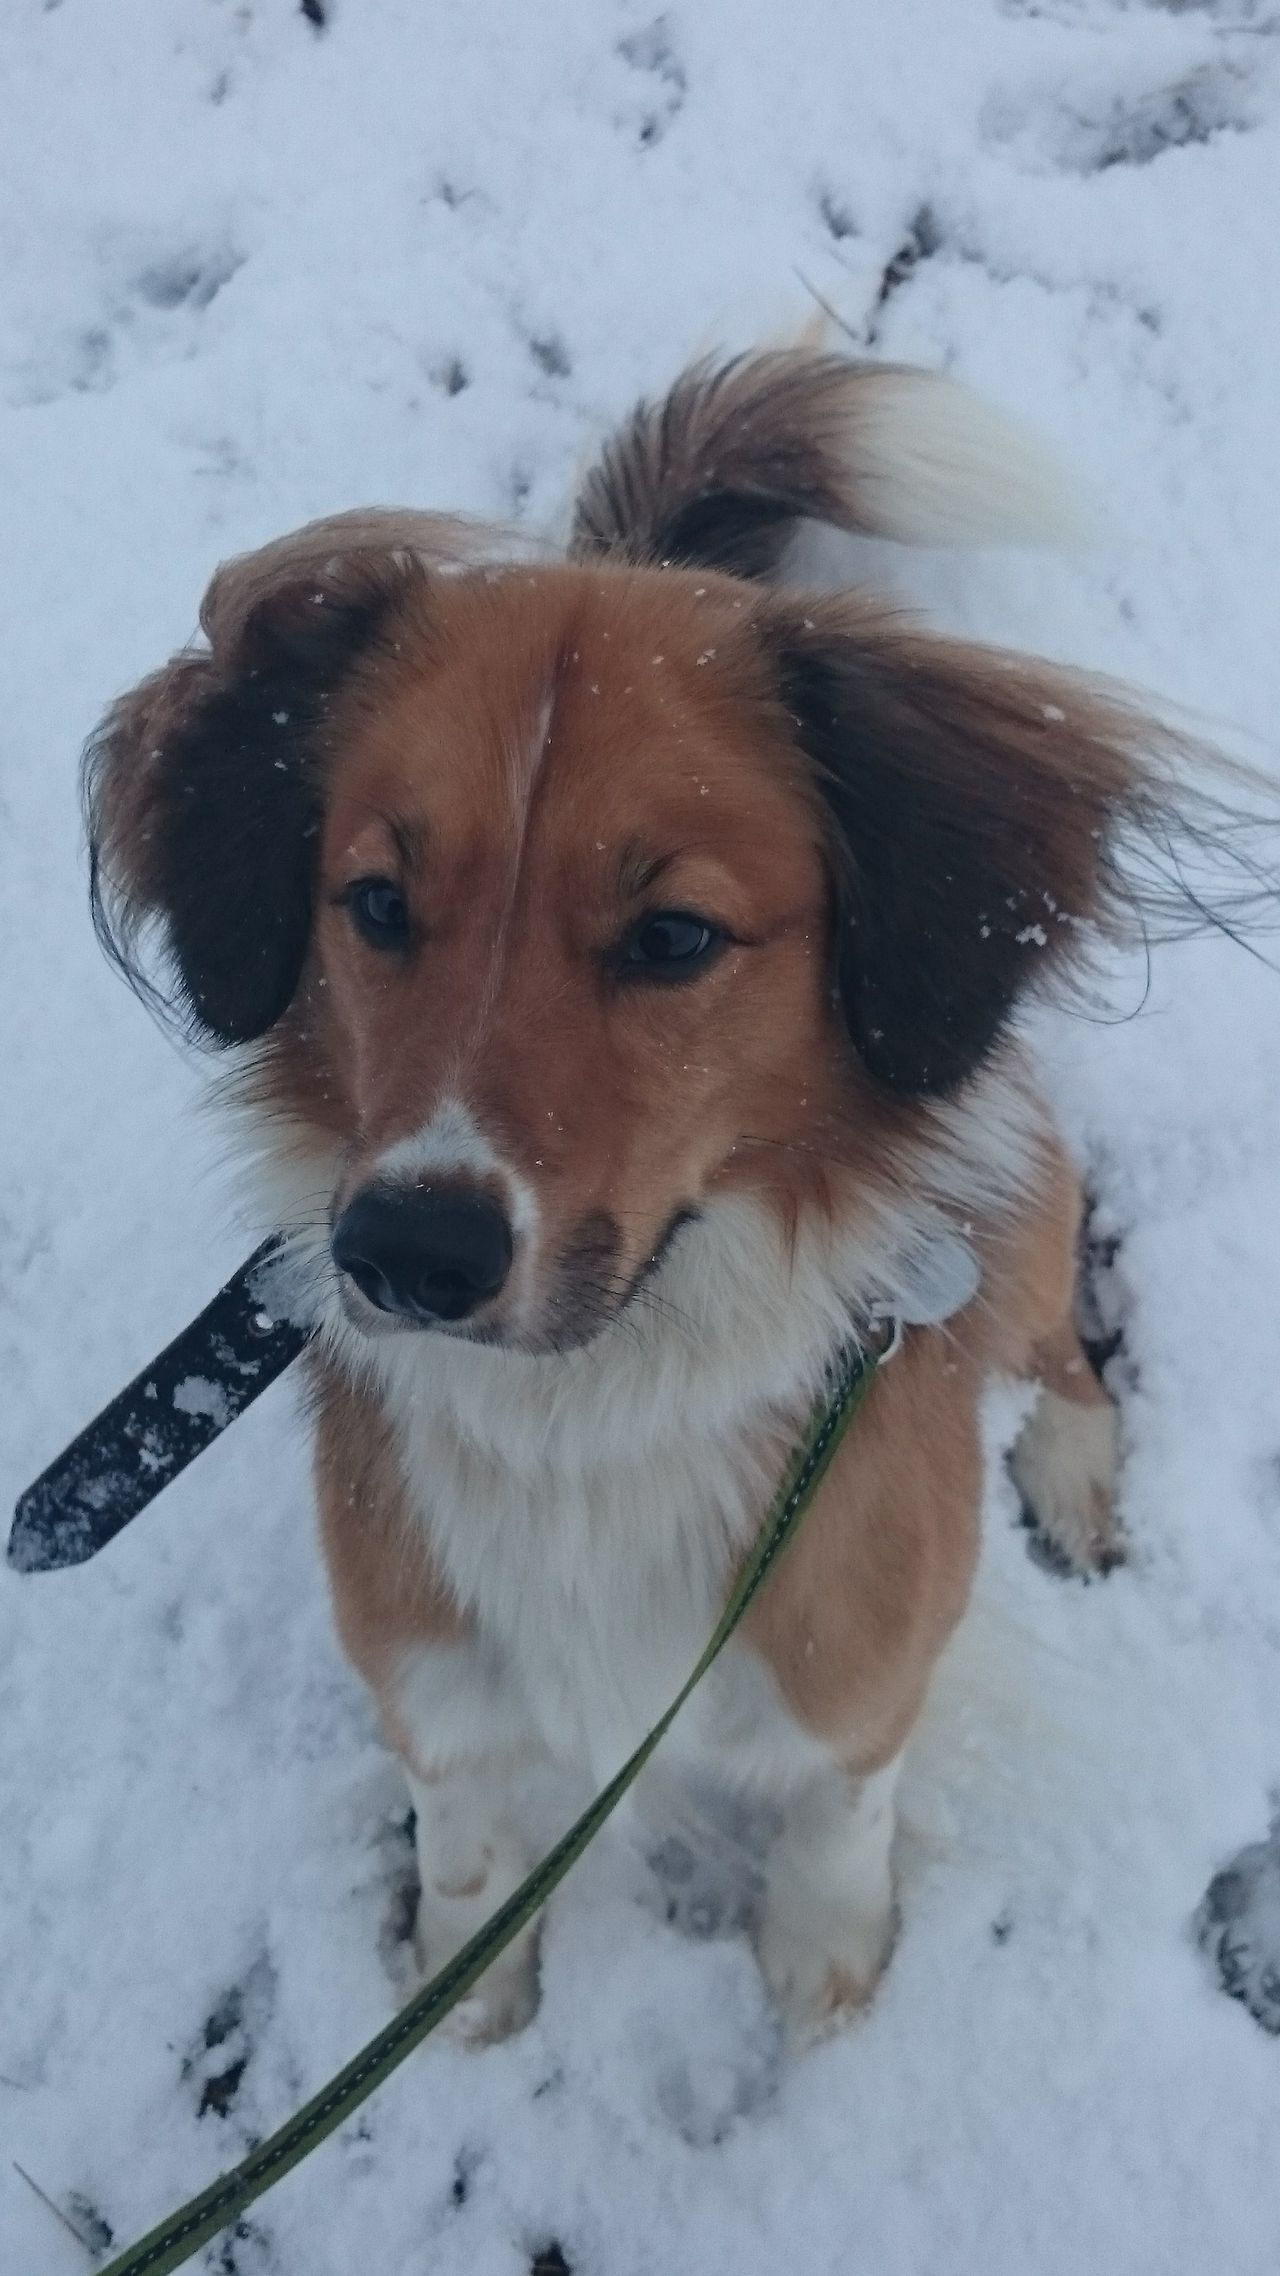 Dog Salaspils Salaspils Latvia Riga Snow Winter собака зима рига саласпилс снег